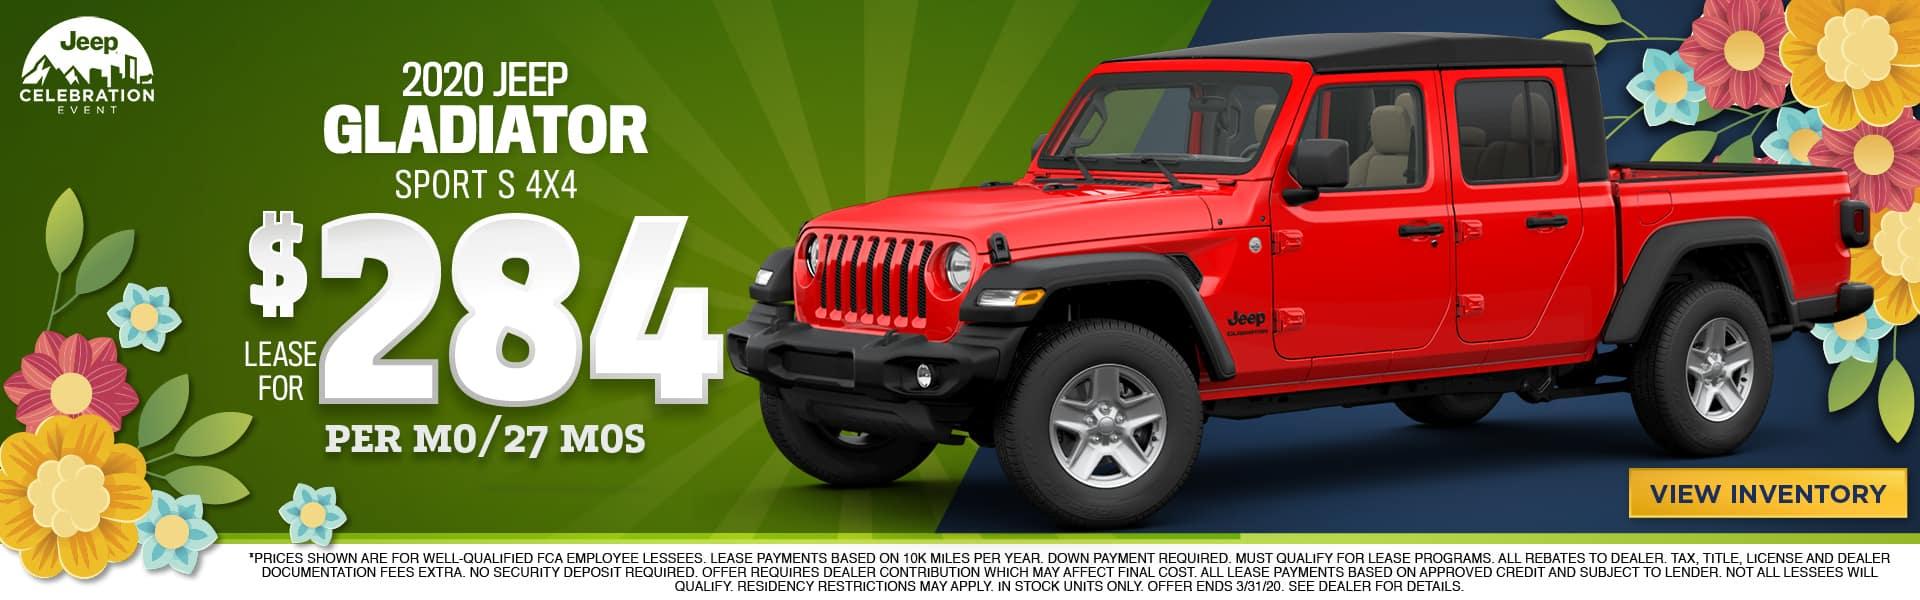 New 2020 Jeep Gladiator For Sale in Pinckney, MI